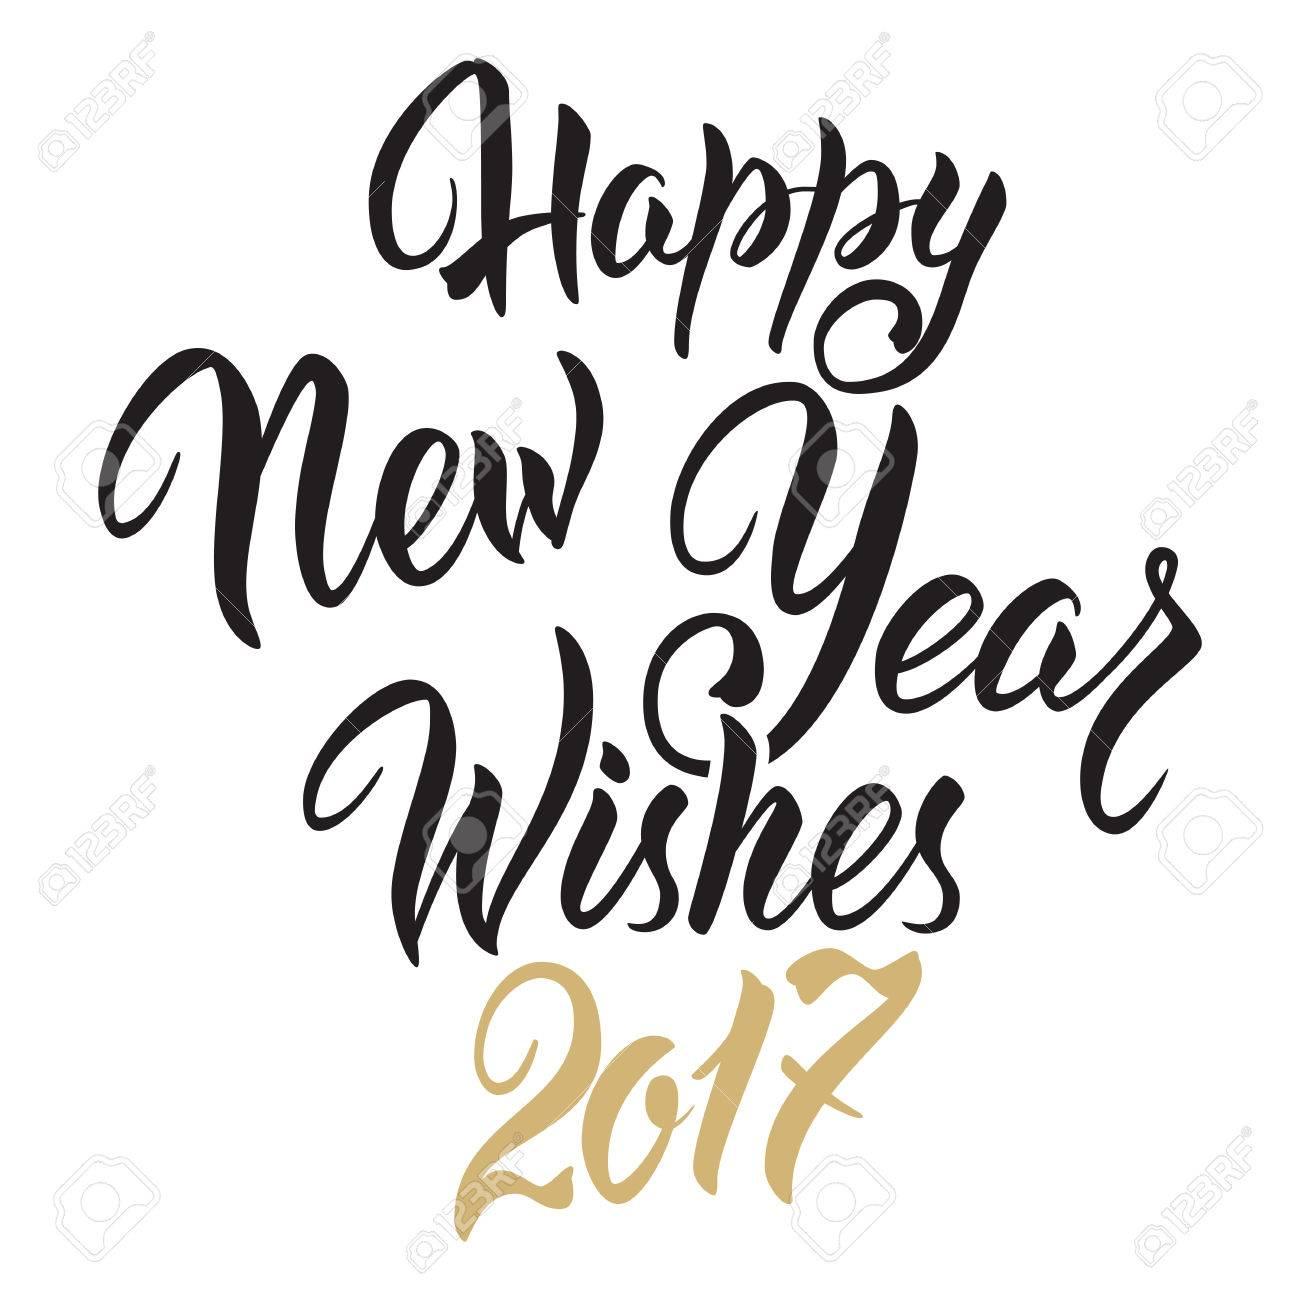 Happy New Year Wishes 2017.Calligraphy Hand Drawn Invitation ...